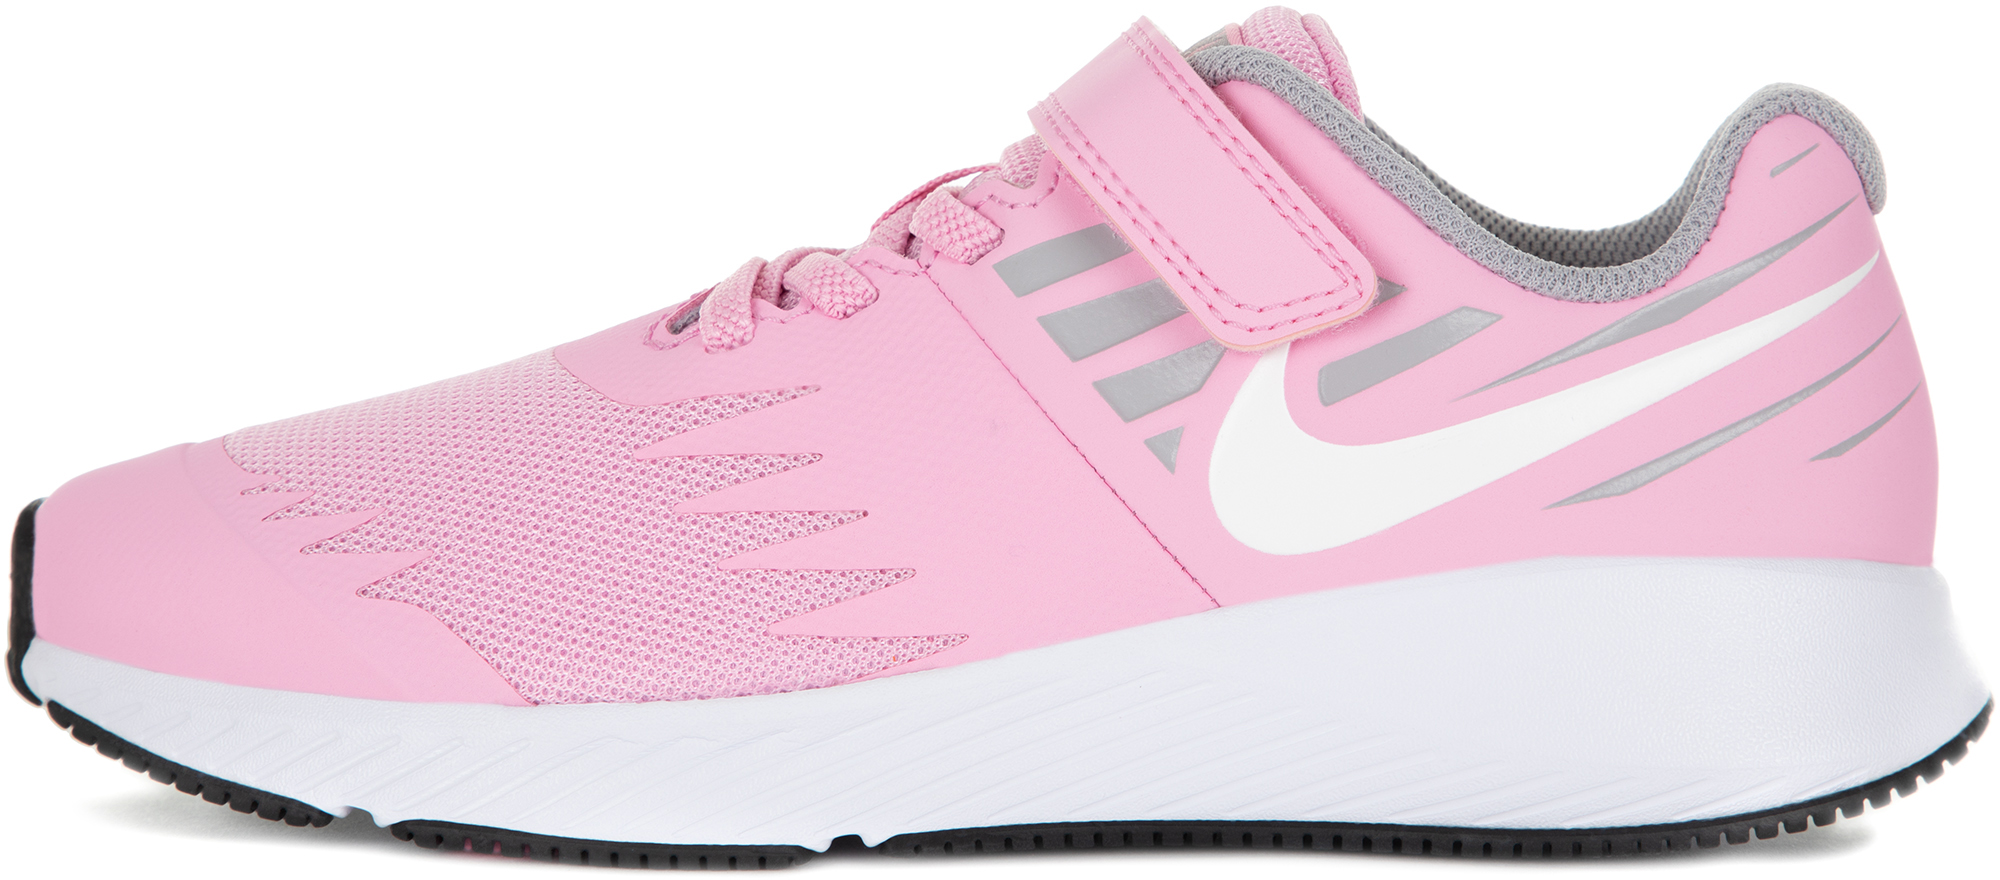 Nike Кроссовки для девочек Star Runner, размер 29